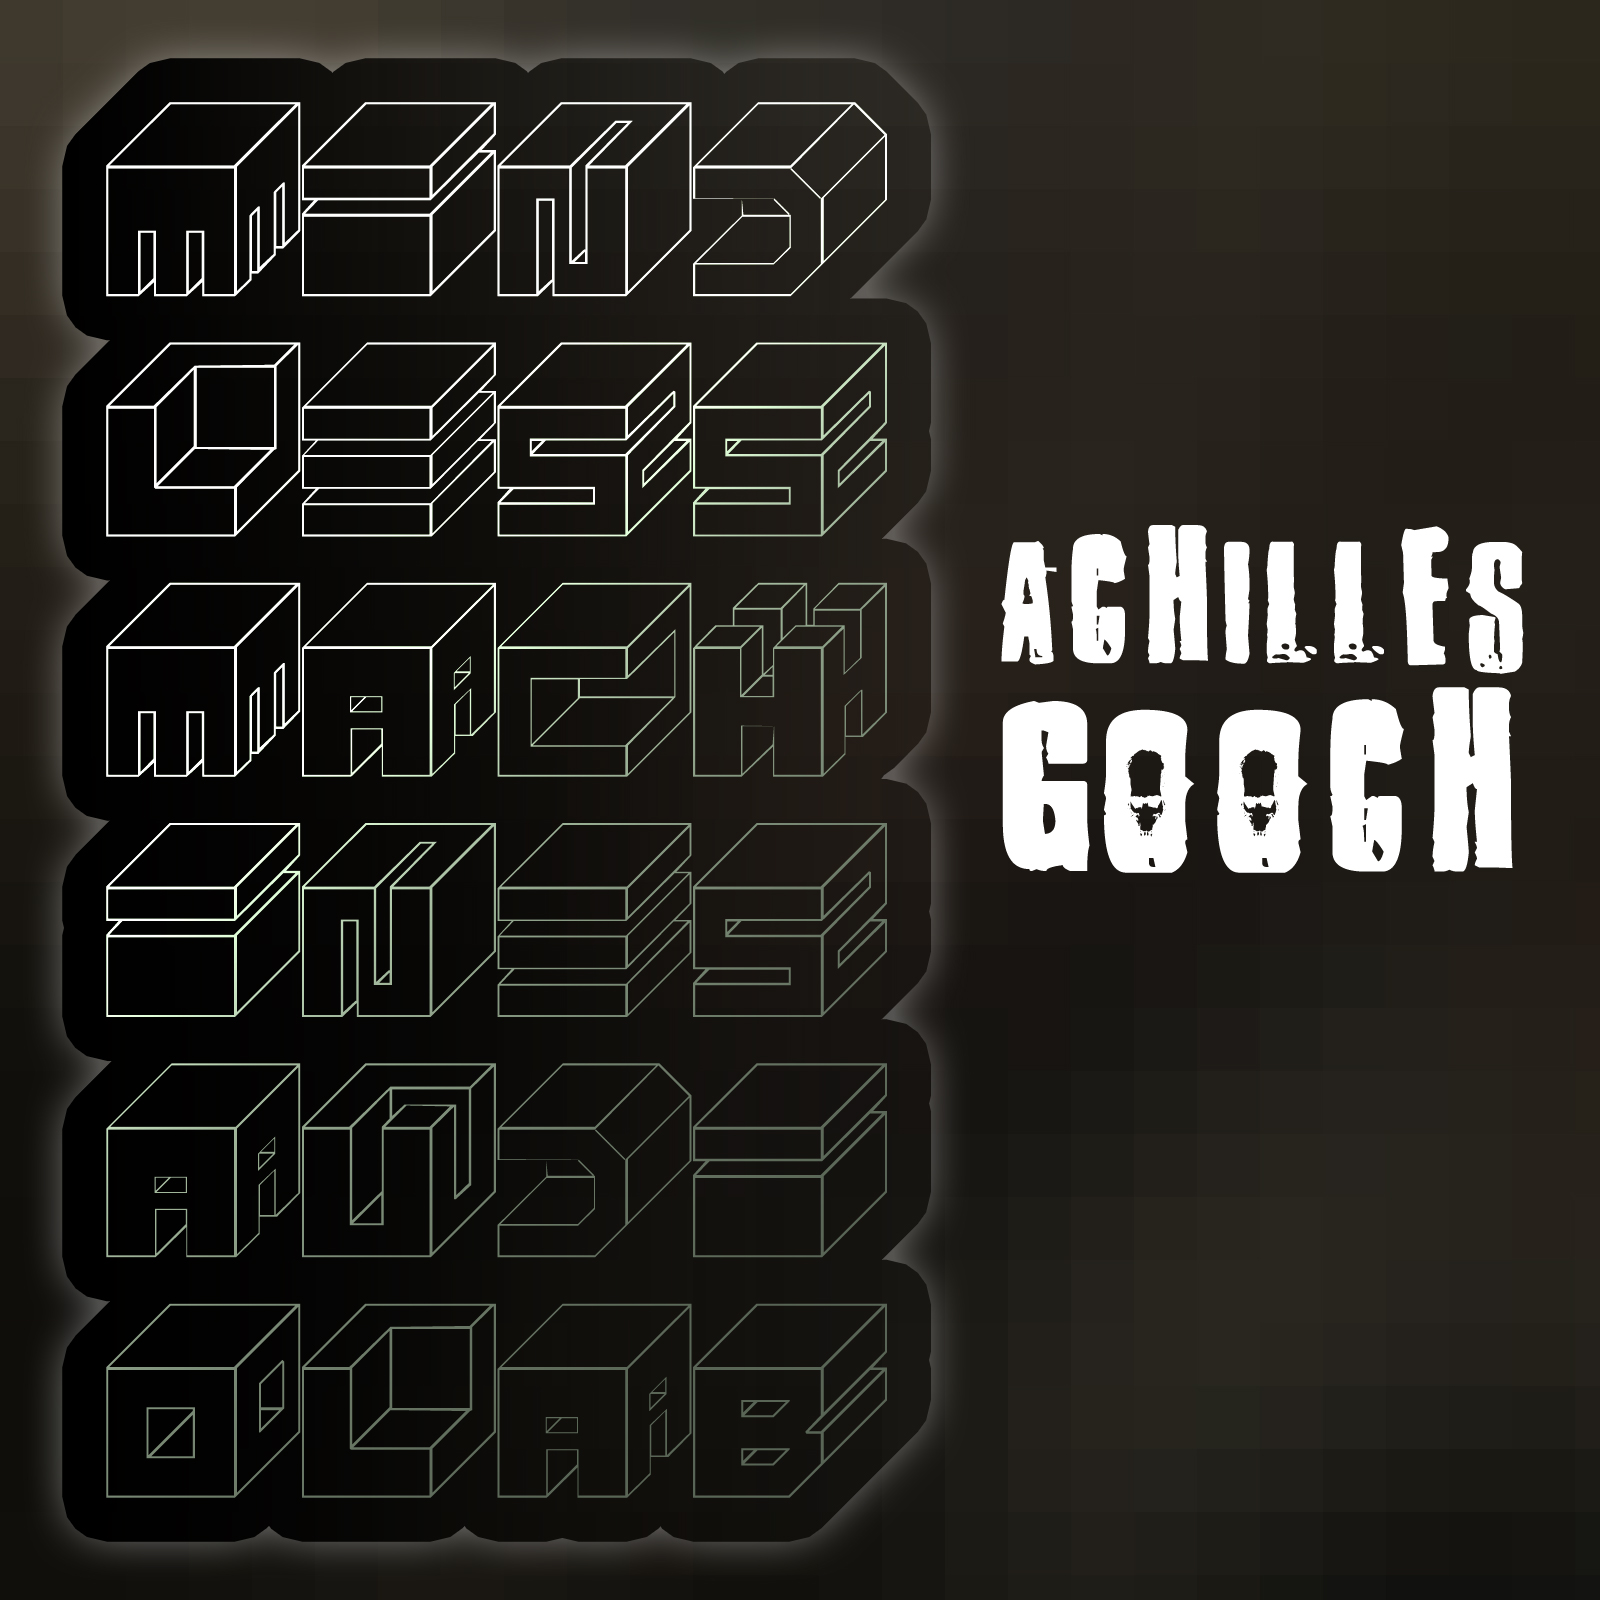 Achilles Gooch by Mindless Machines Audio Lab